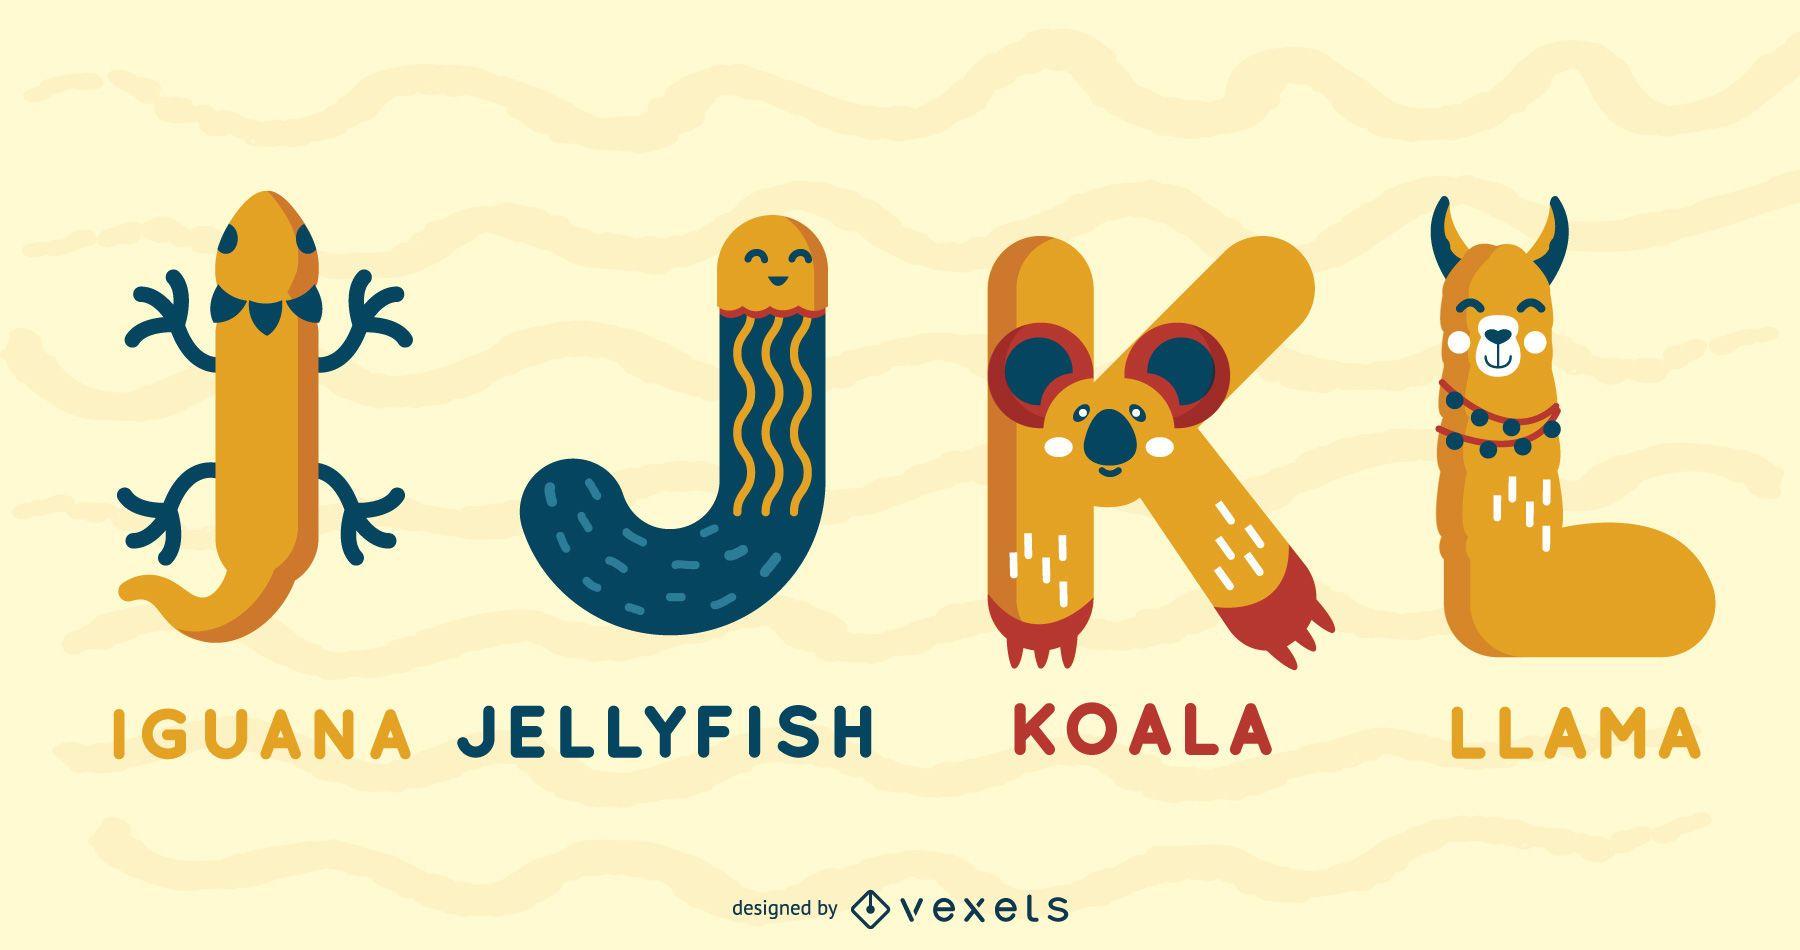 Pacote Ilustrado do Alfabeto Animal IJKL